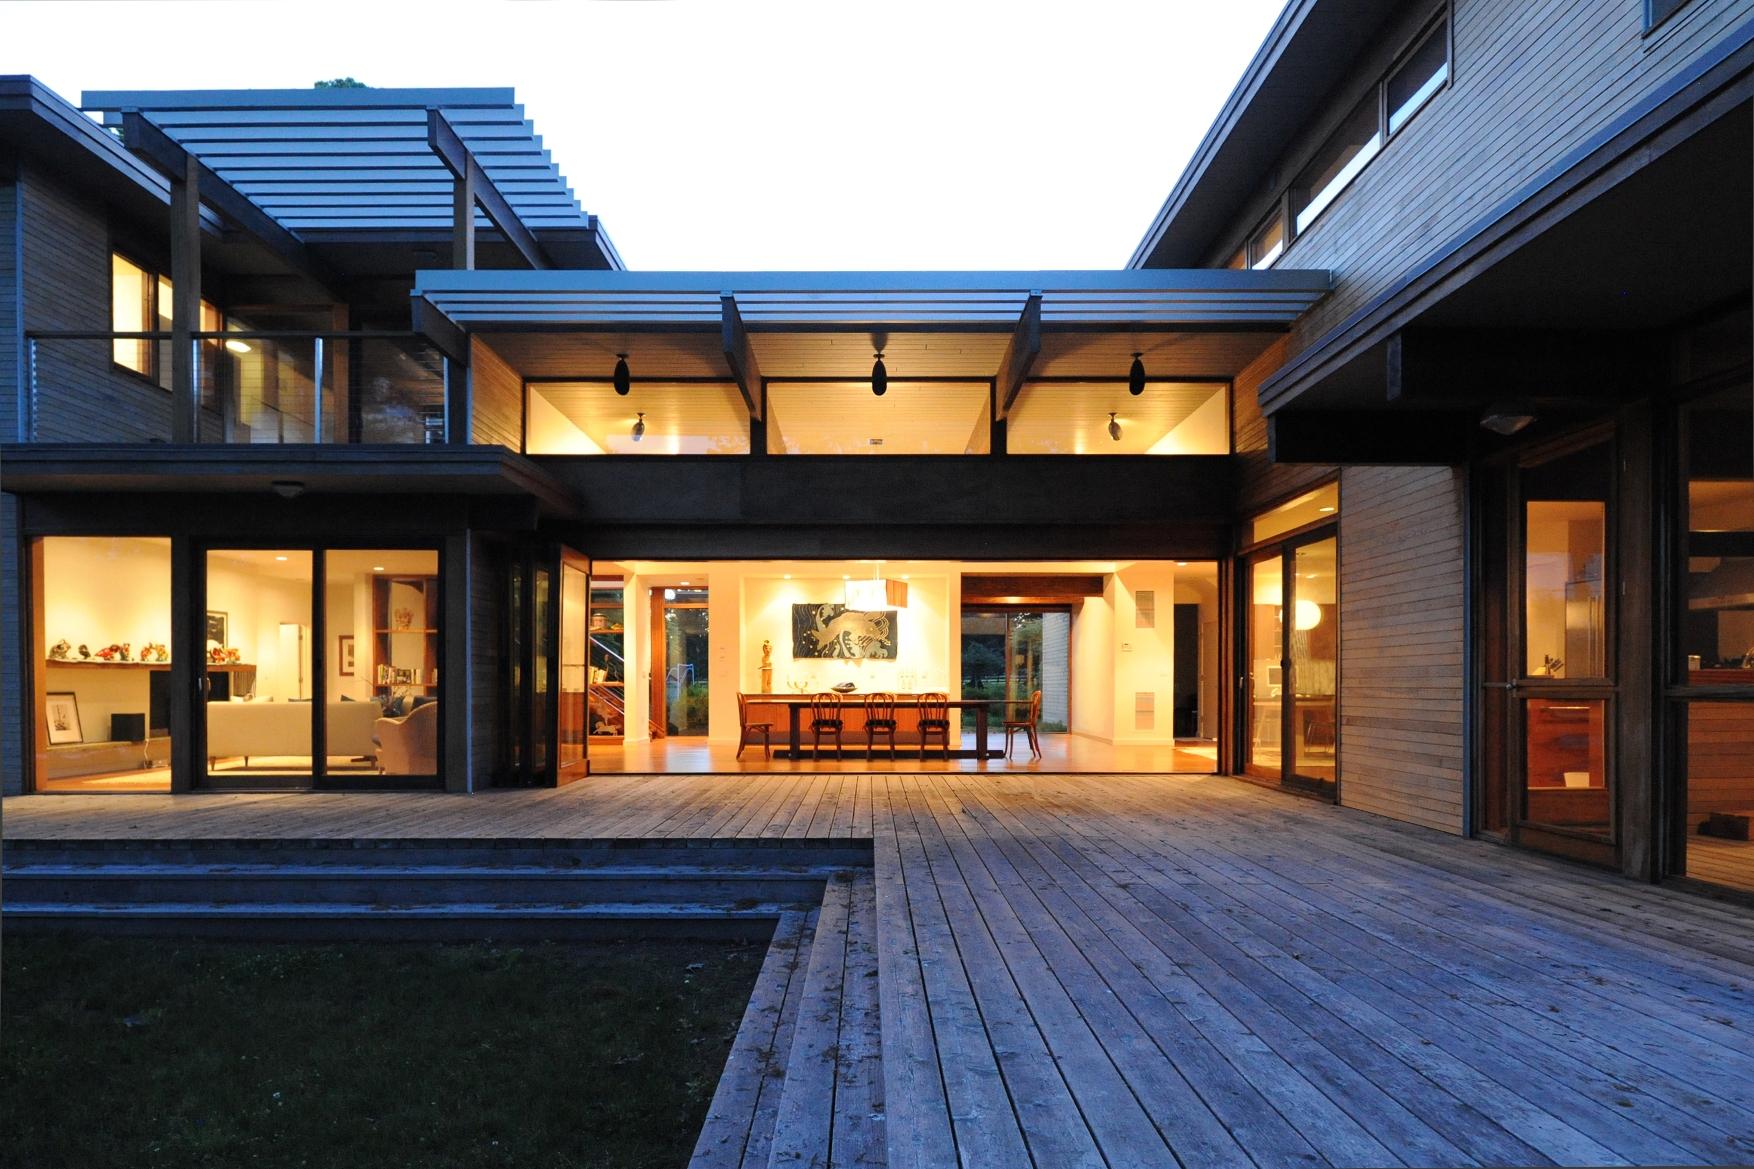 turkel_modern_design_prefab_shelter_island_deck_backyard.jpg